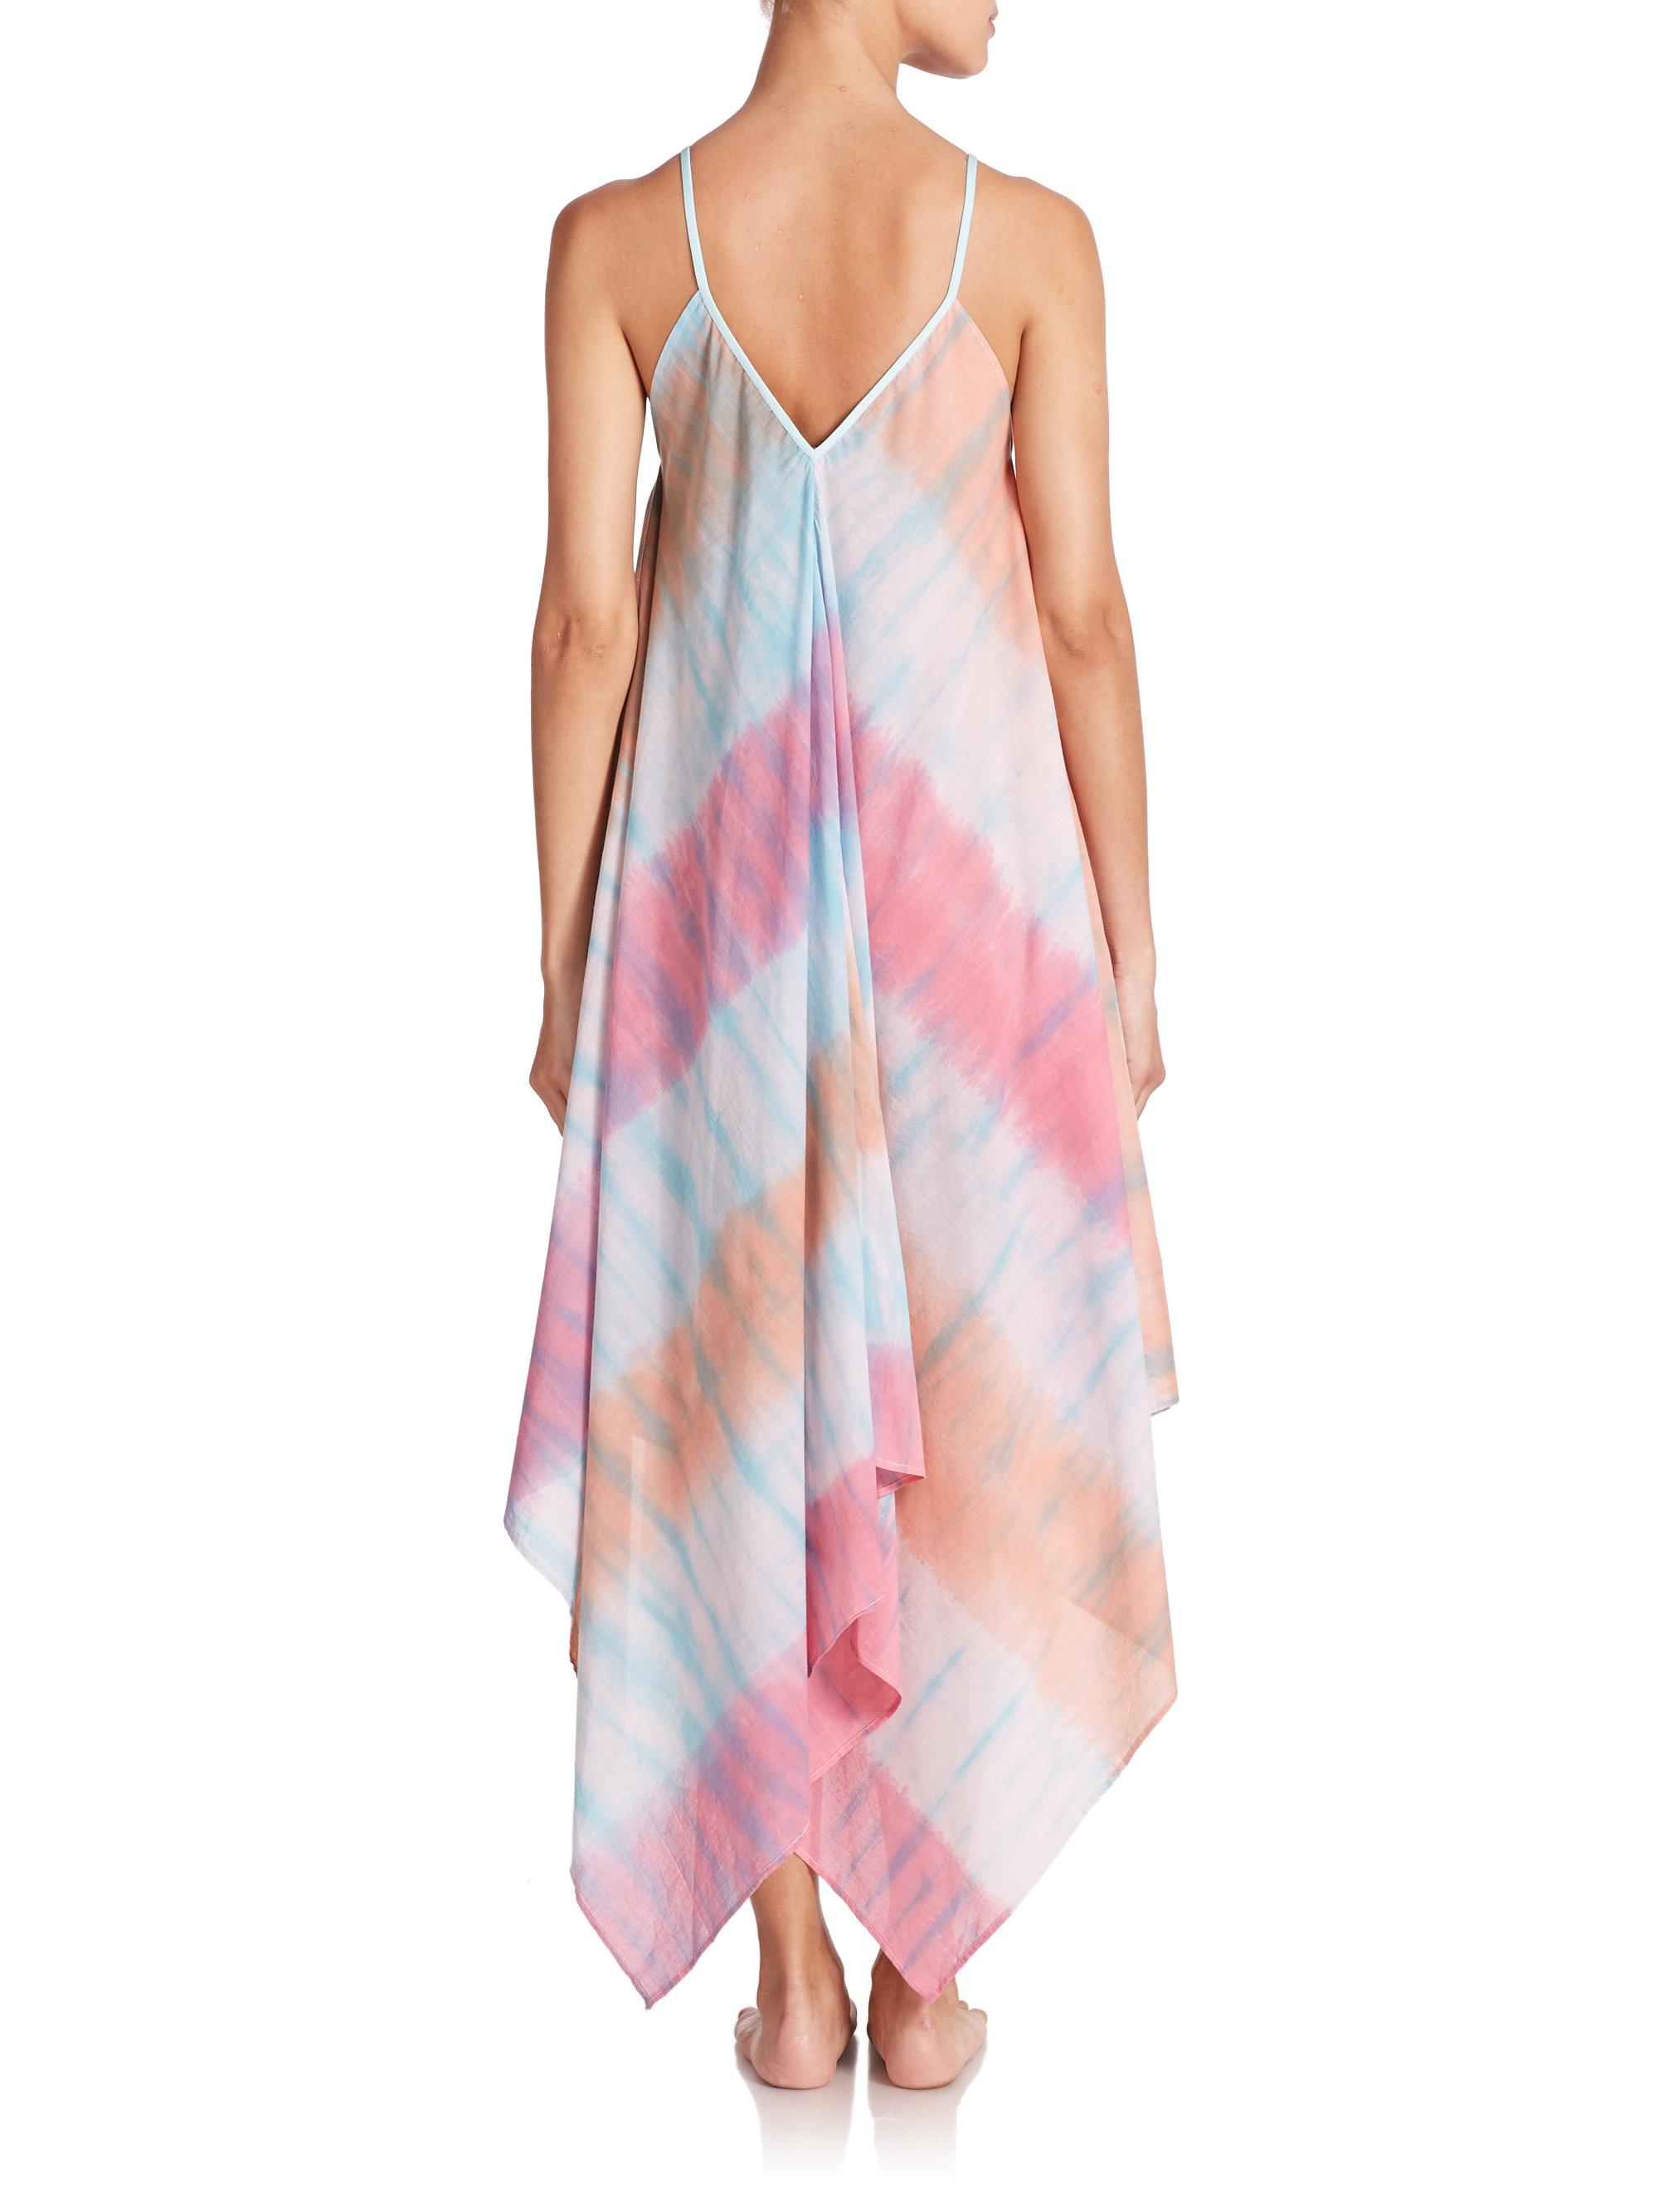 Roberta Roller Rabbit Cotton Tie Dye Scarf Dress Lyst